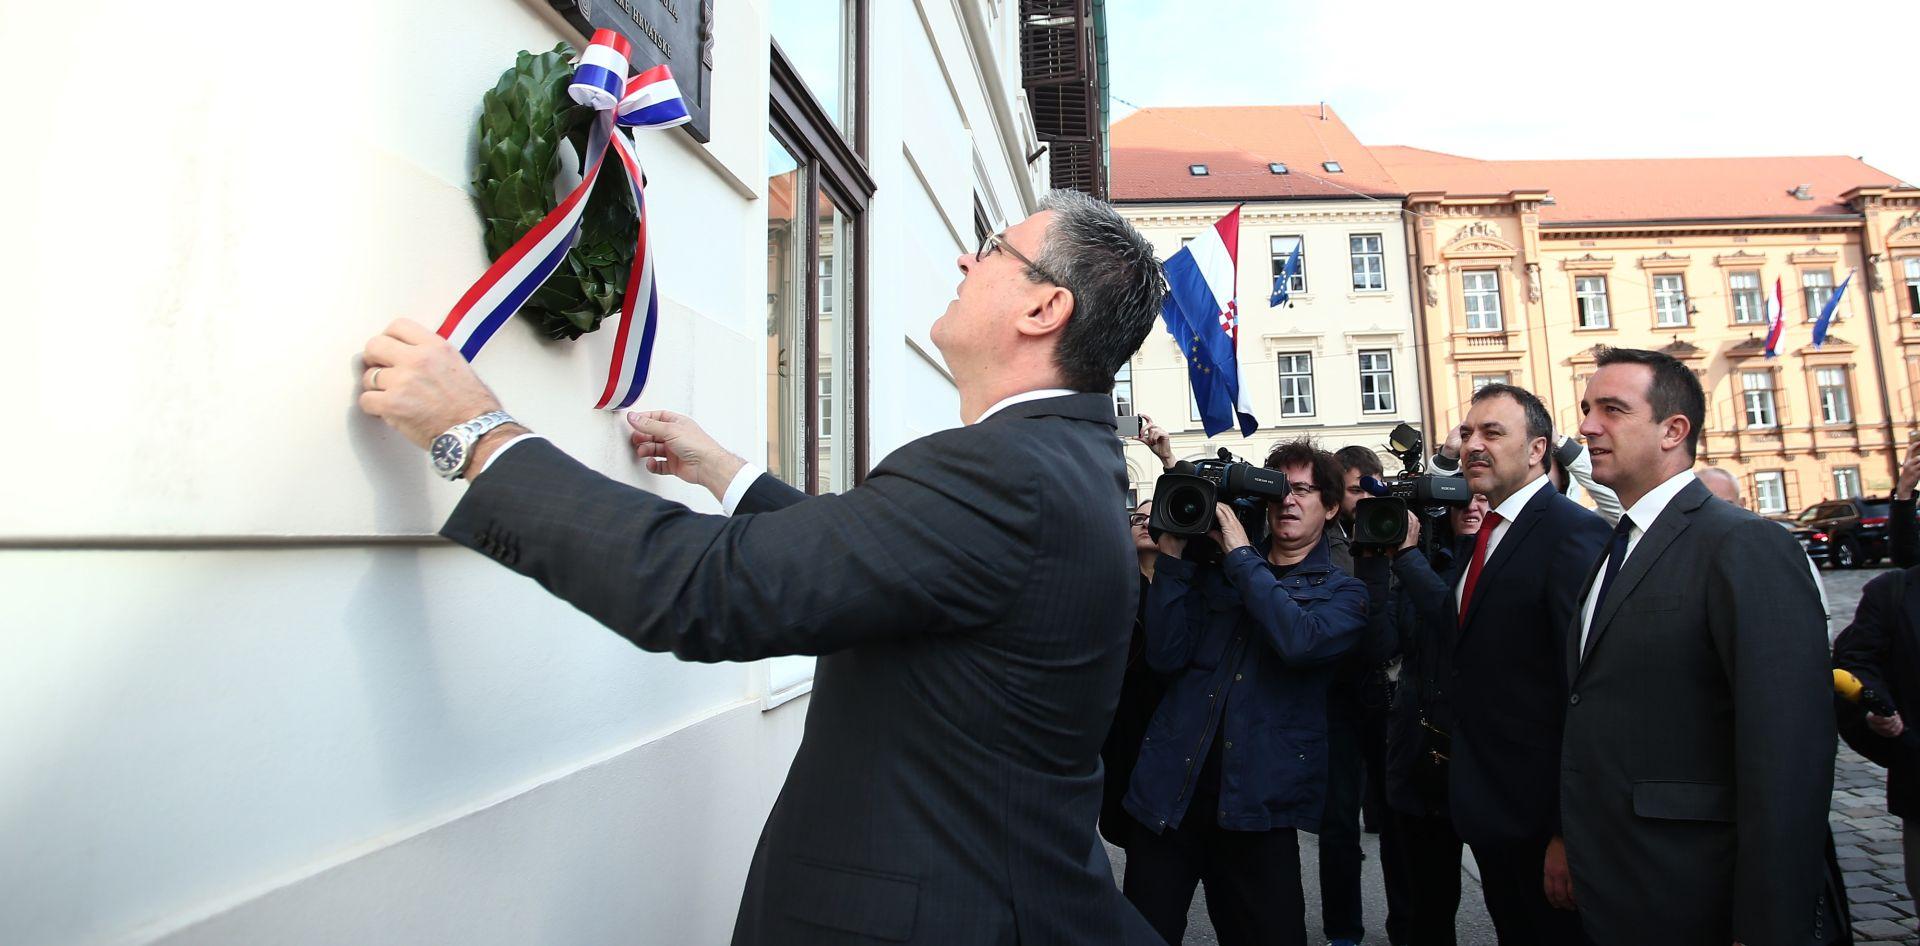 Orešković položio lovorov vijenac na spomen-ploču na 25. obljetnicu raketiranja Banskih dvora